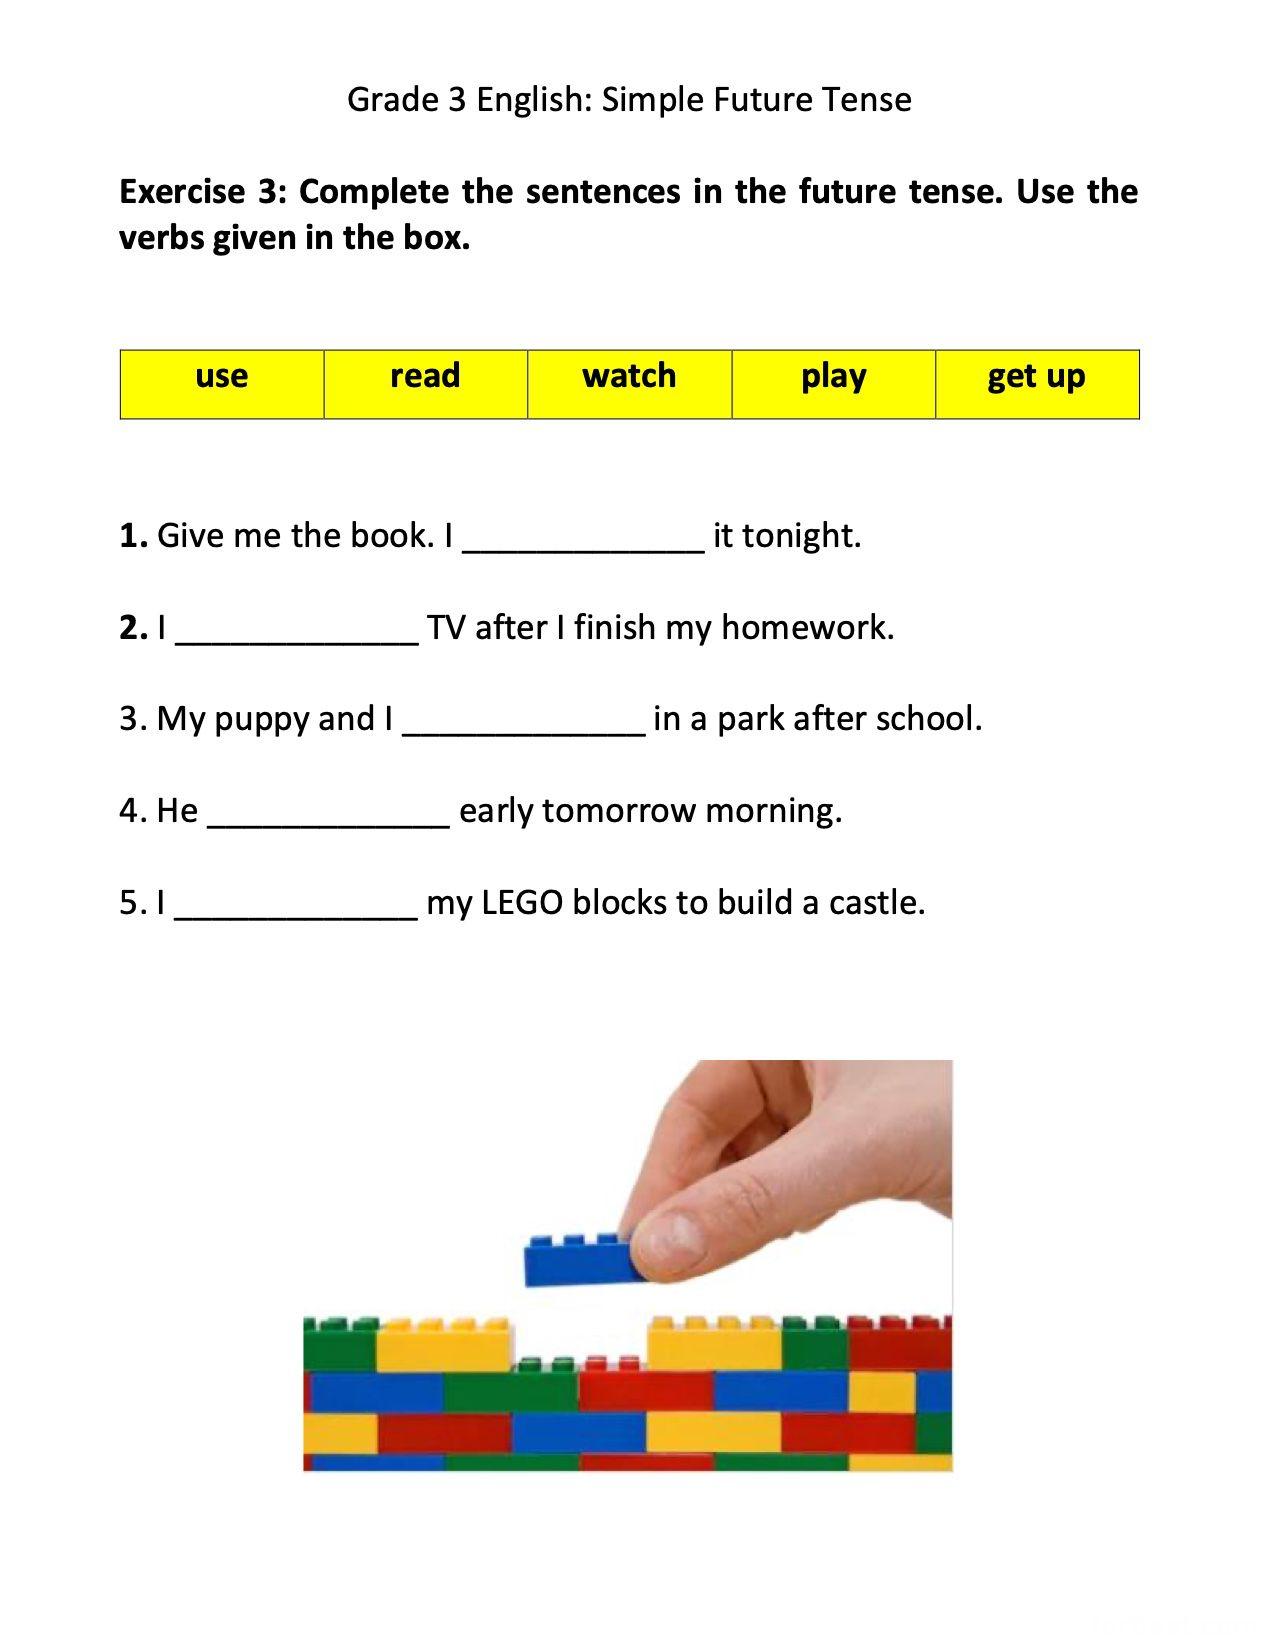 hight resolution of Grade 3 English: Future Tense - Grade 3 - FORBEST ACADEMY